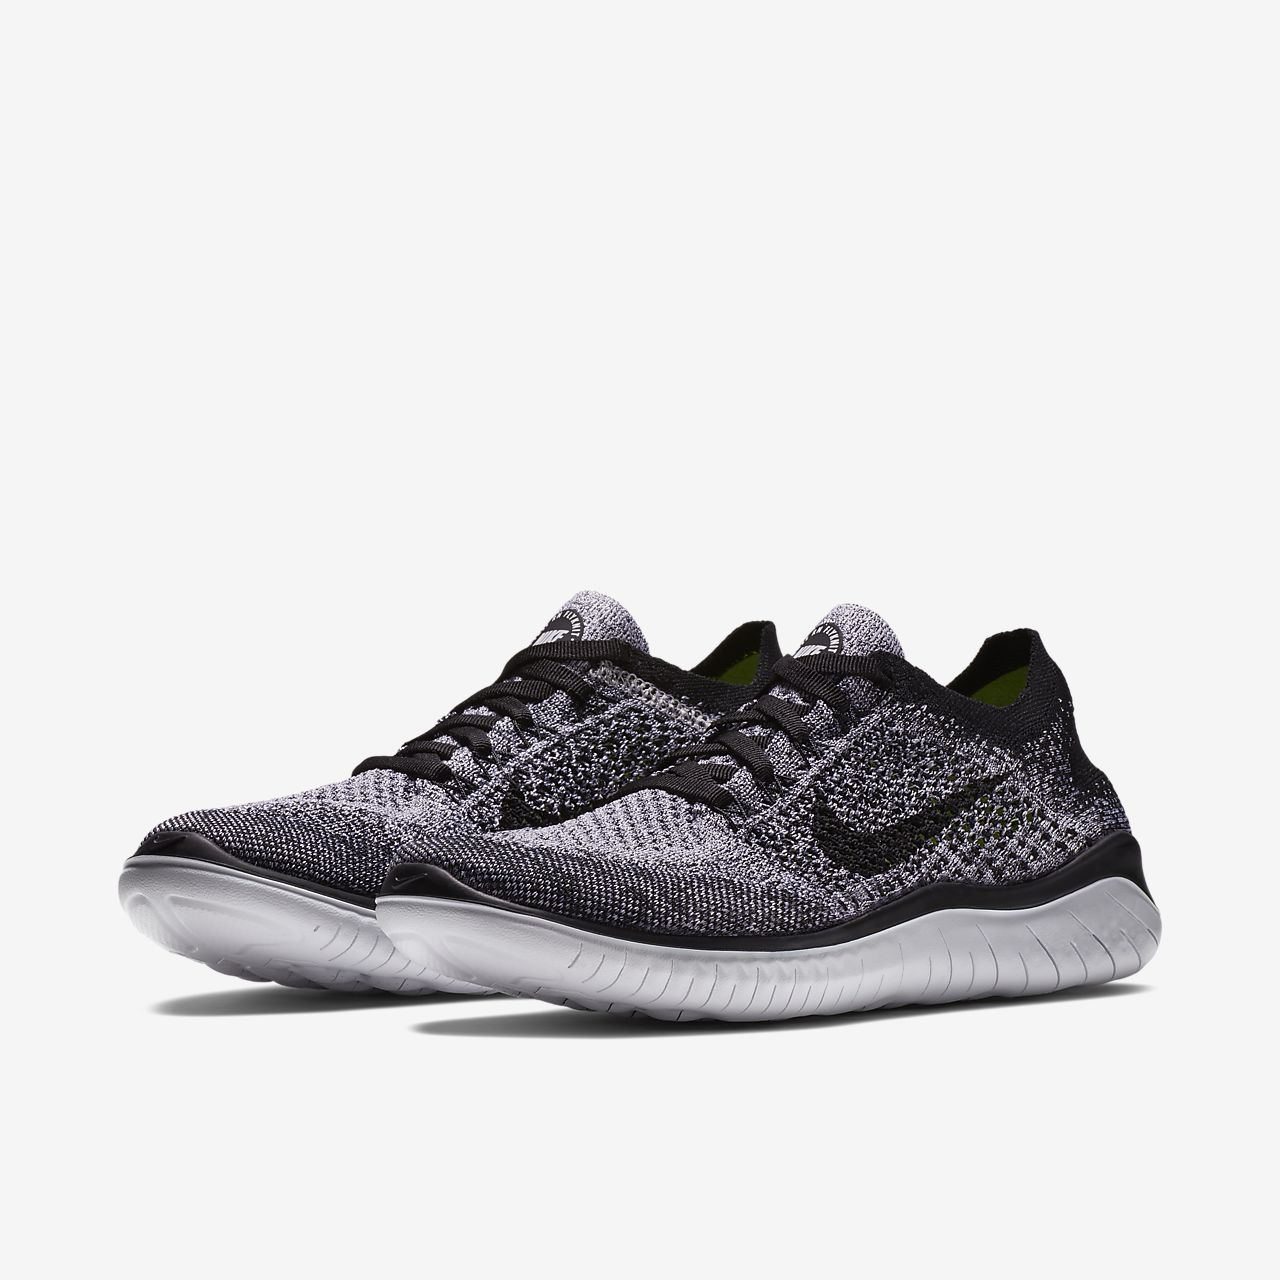 prix de sortie Footlocker Nike Flyknit Libre Rn 2018 Critique Sous Vide nicekicks à vendre QRf6OU1